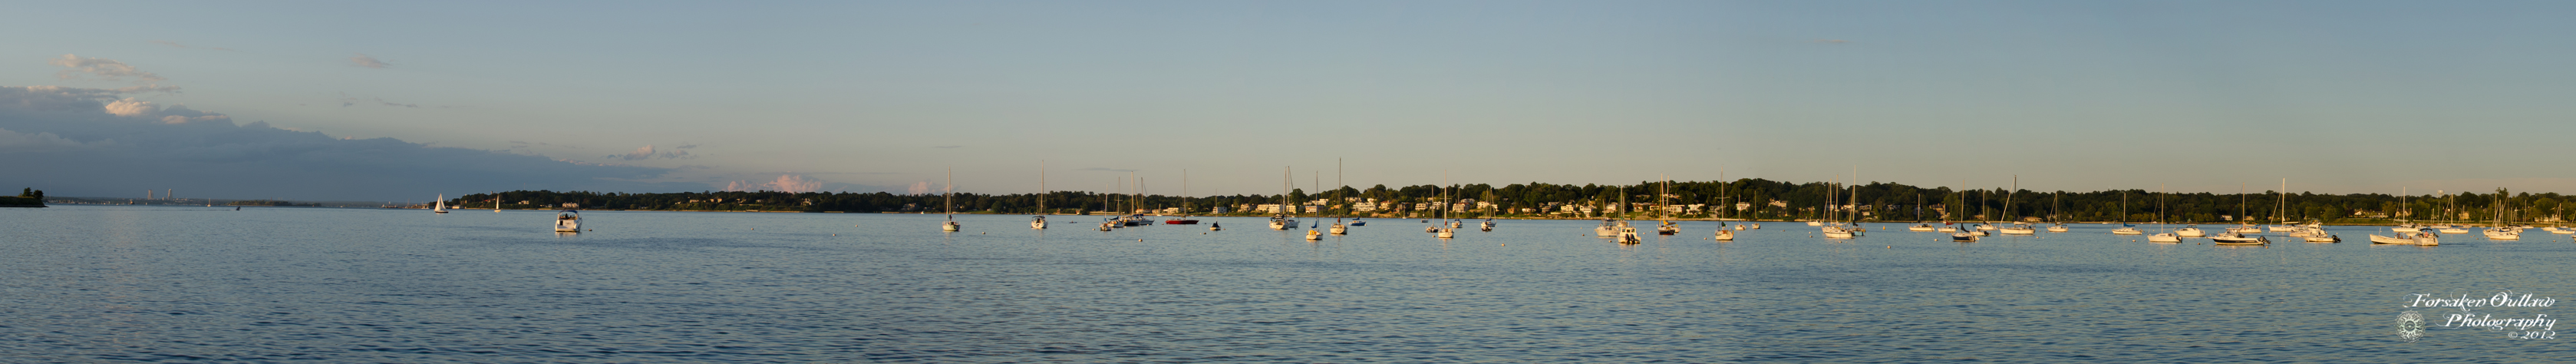 Bayside Marina Panorama by ForsakenOutlaw